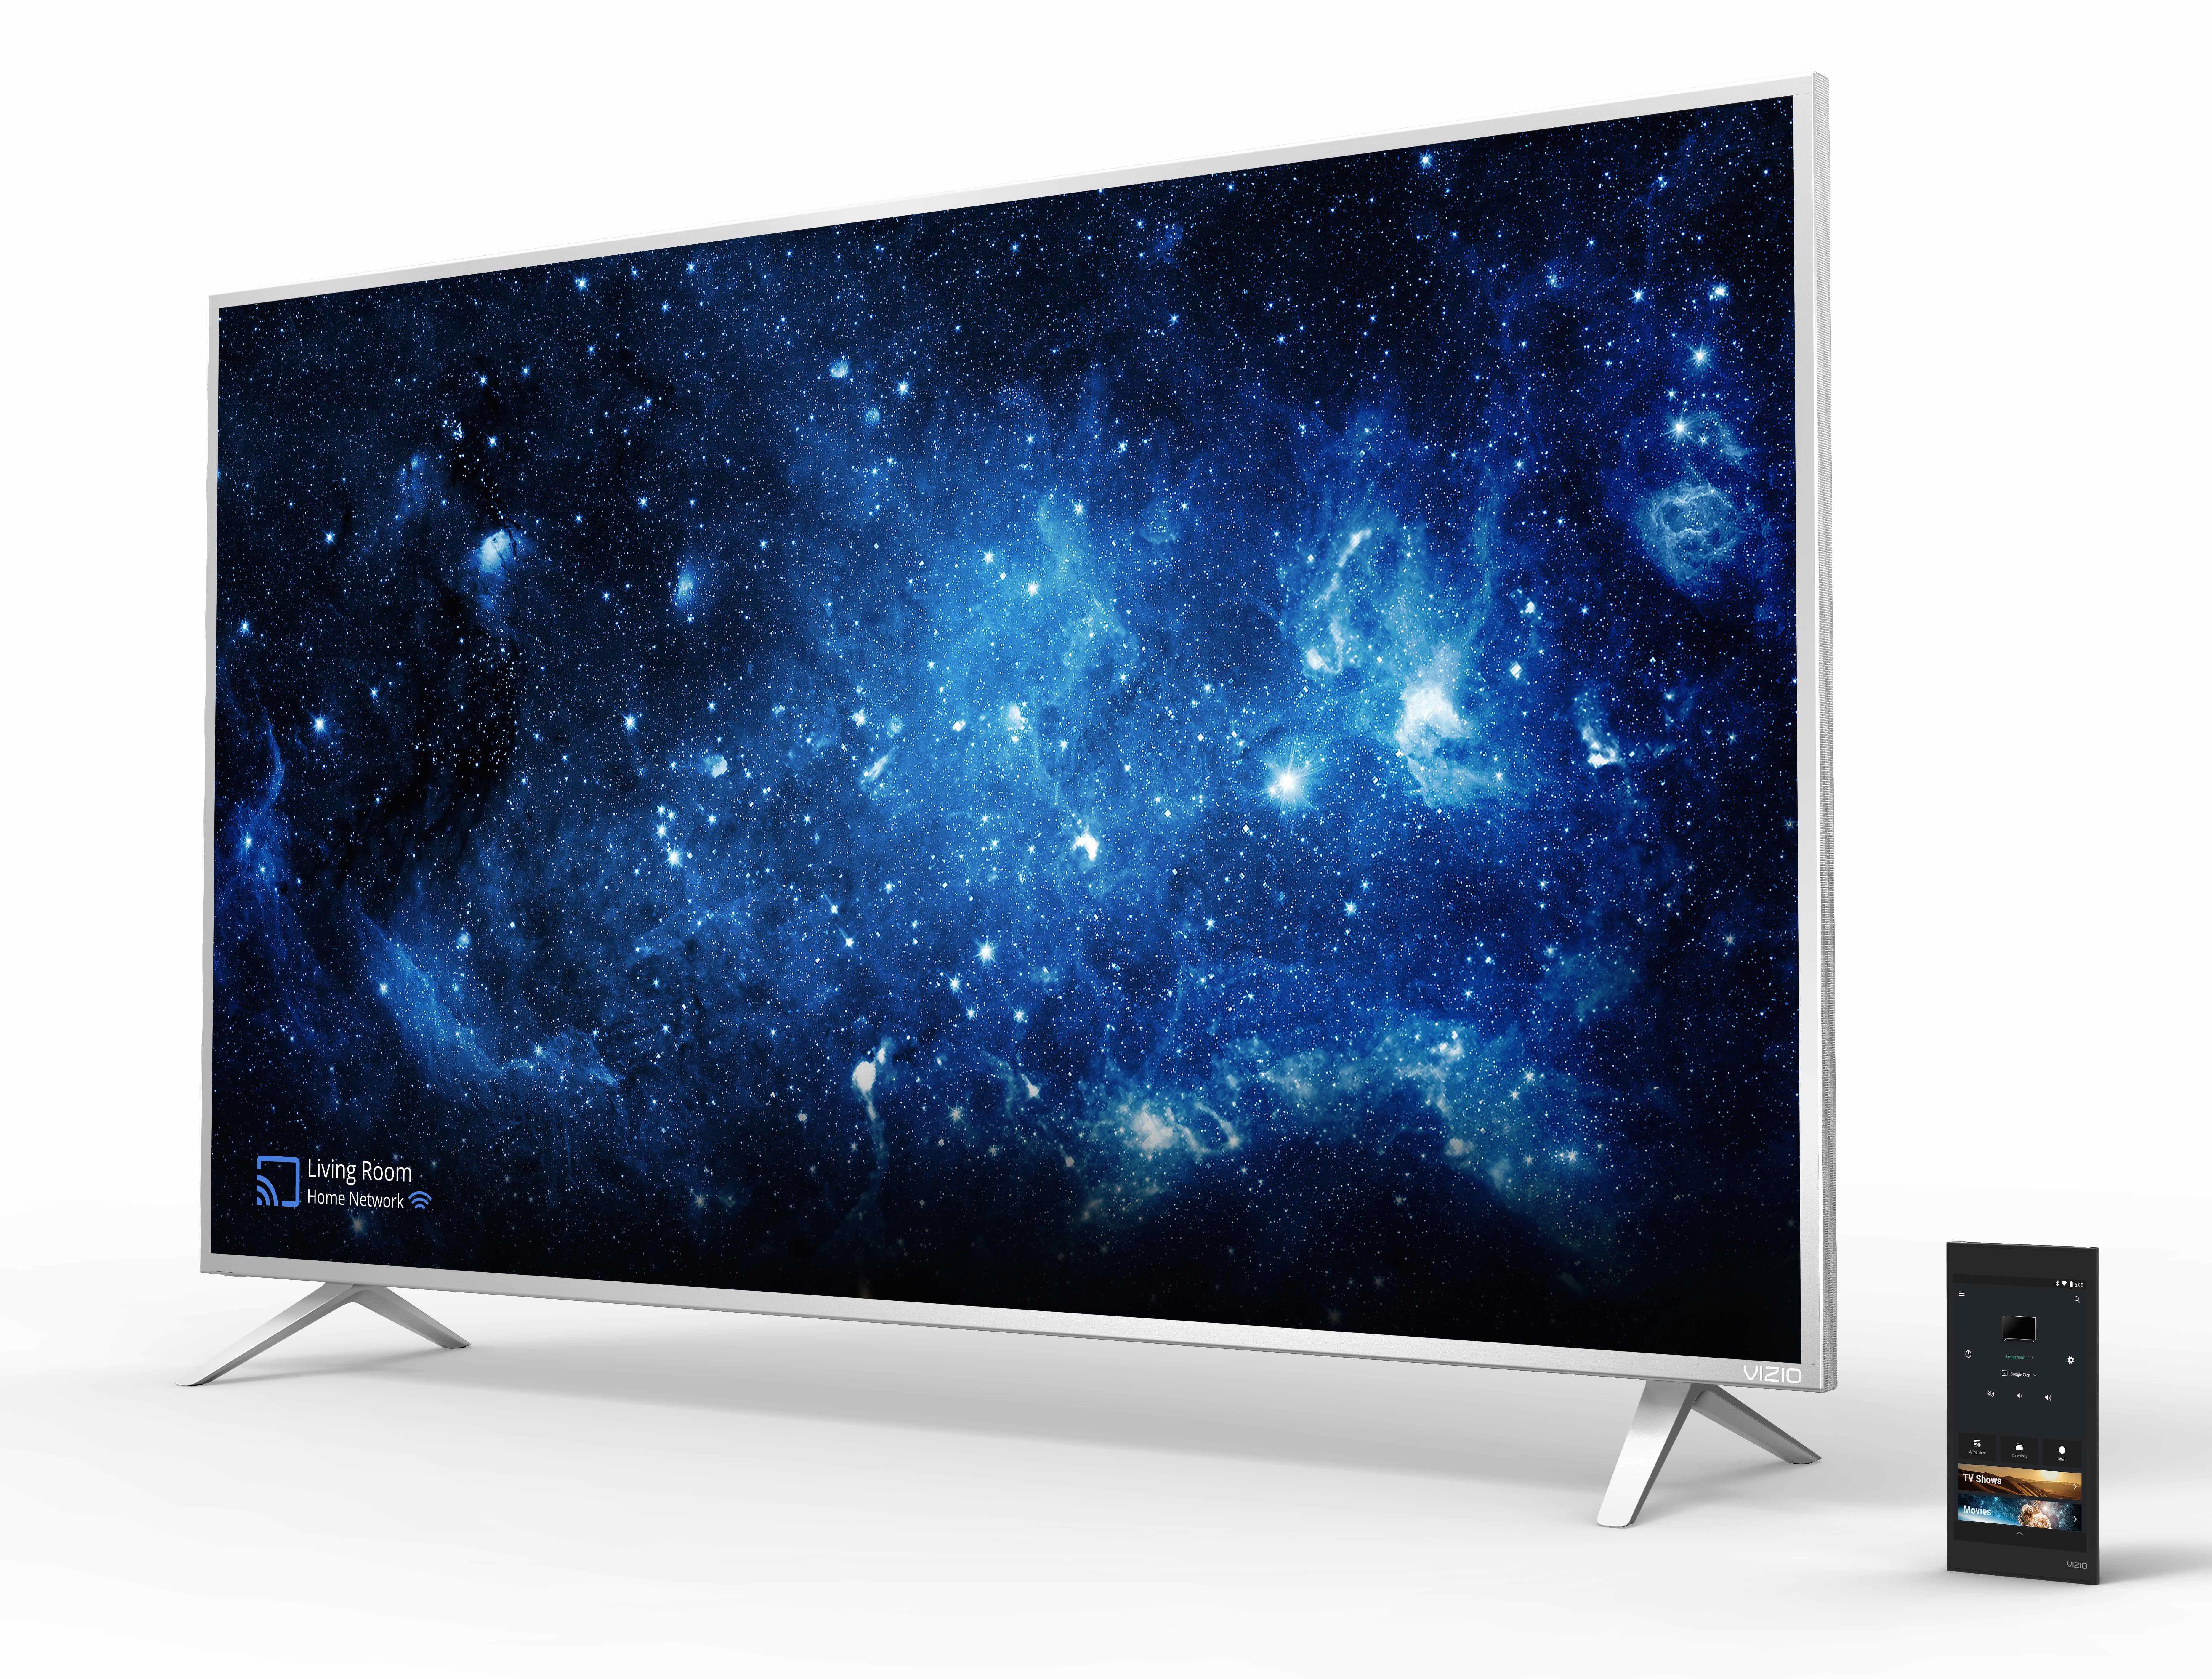 Vizio S New Hdr 4k Tvs Have Google Cast Built In Come